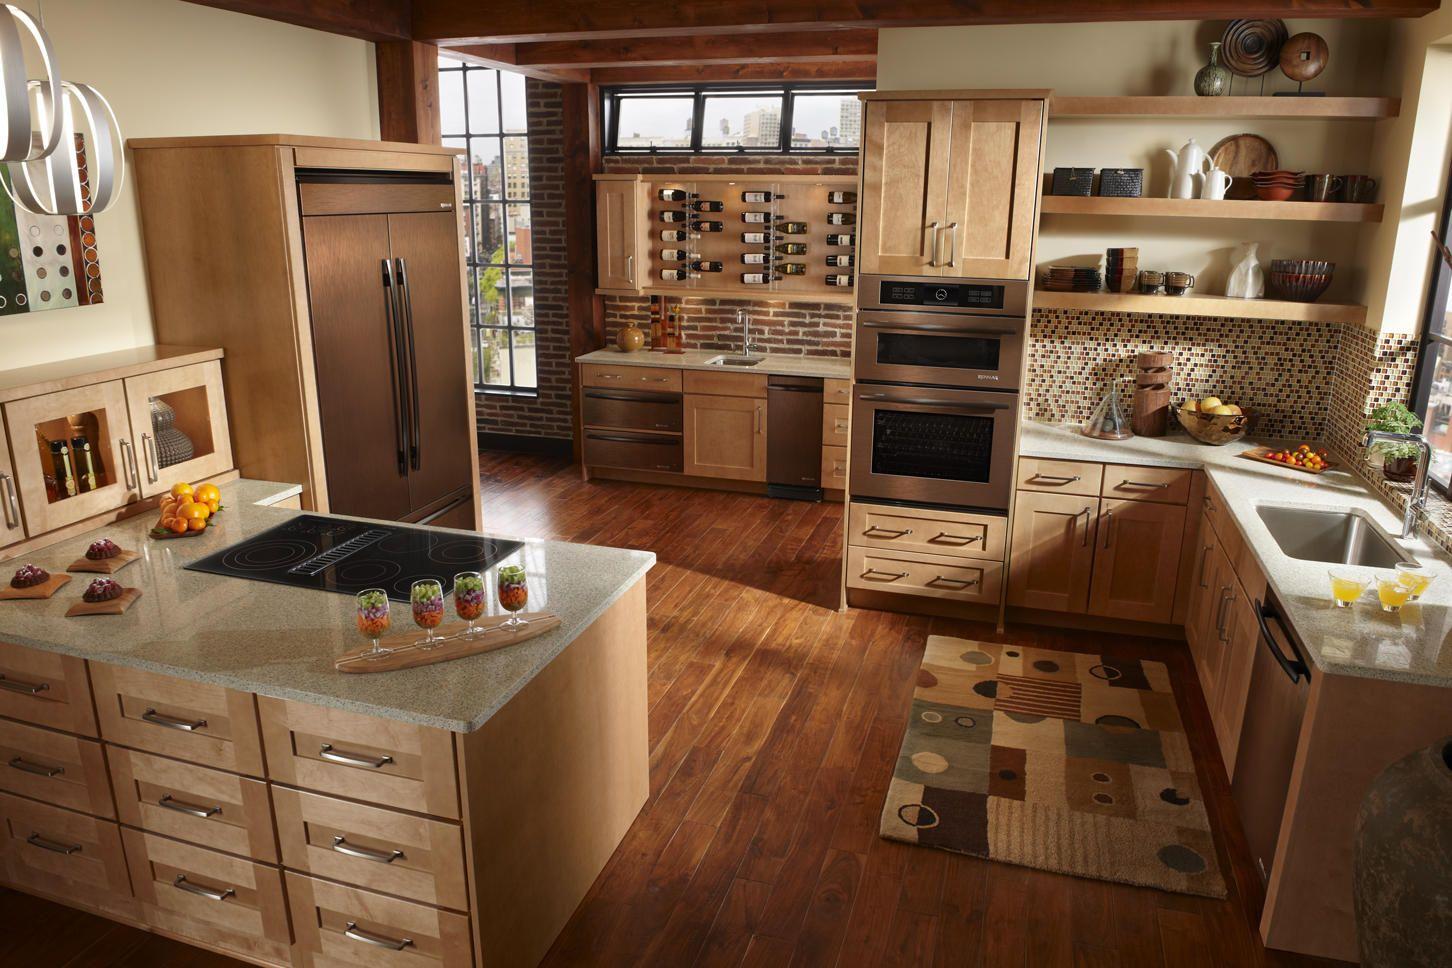 bronze kitchen appliances - Google Search | New Appliance Colors ...